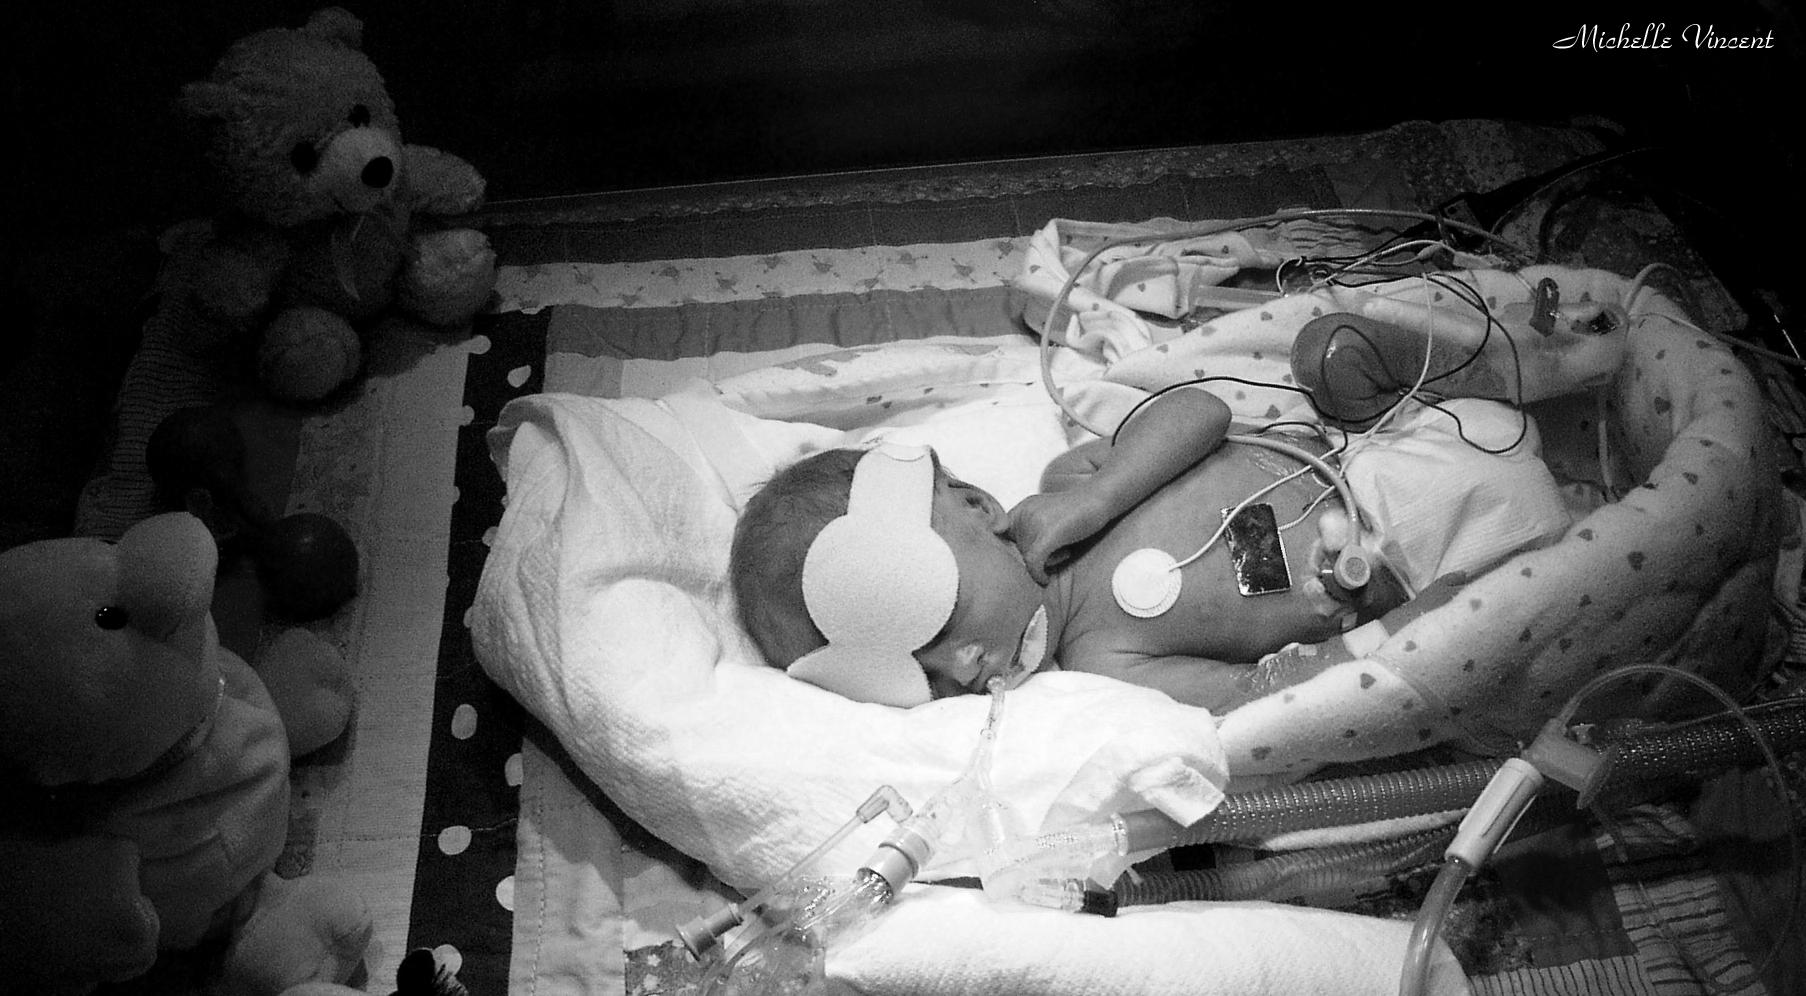 patrick-newborn-hospital-2